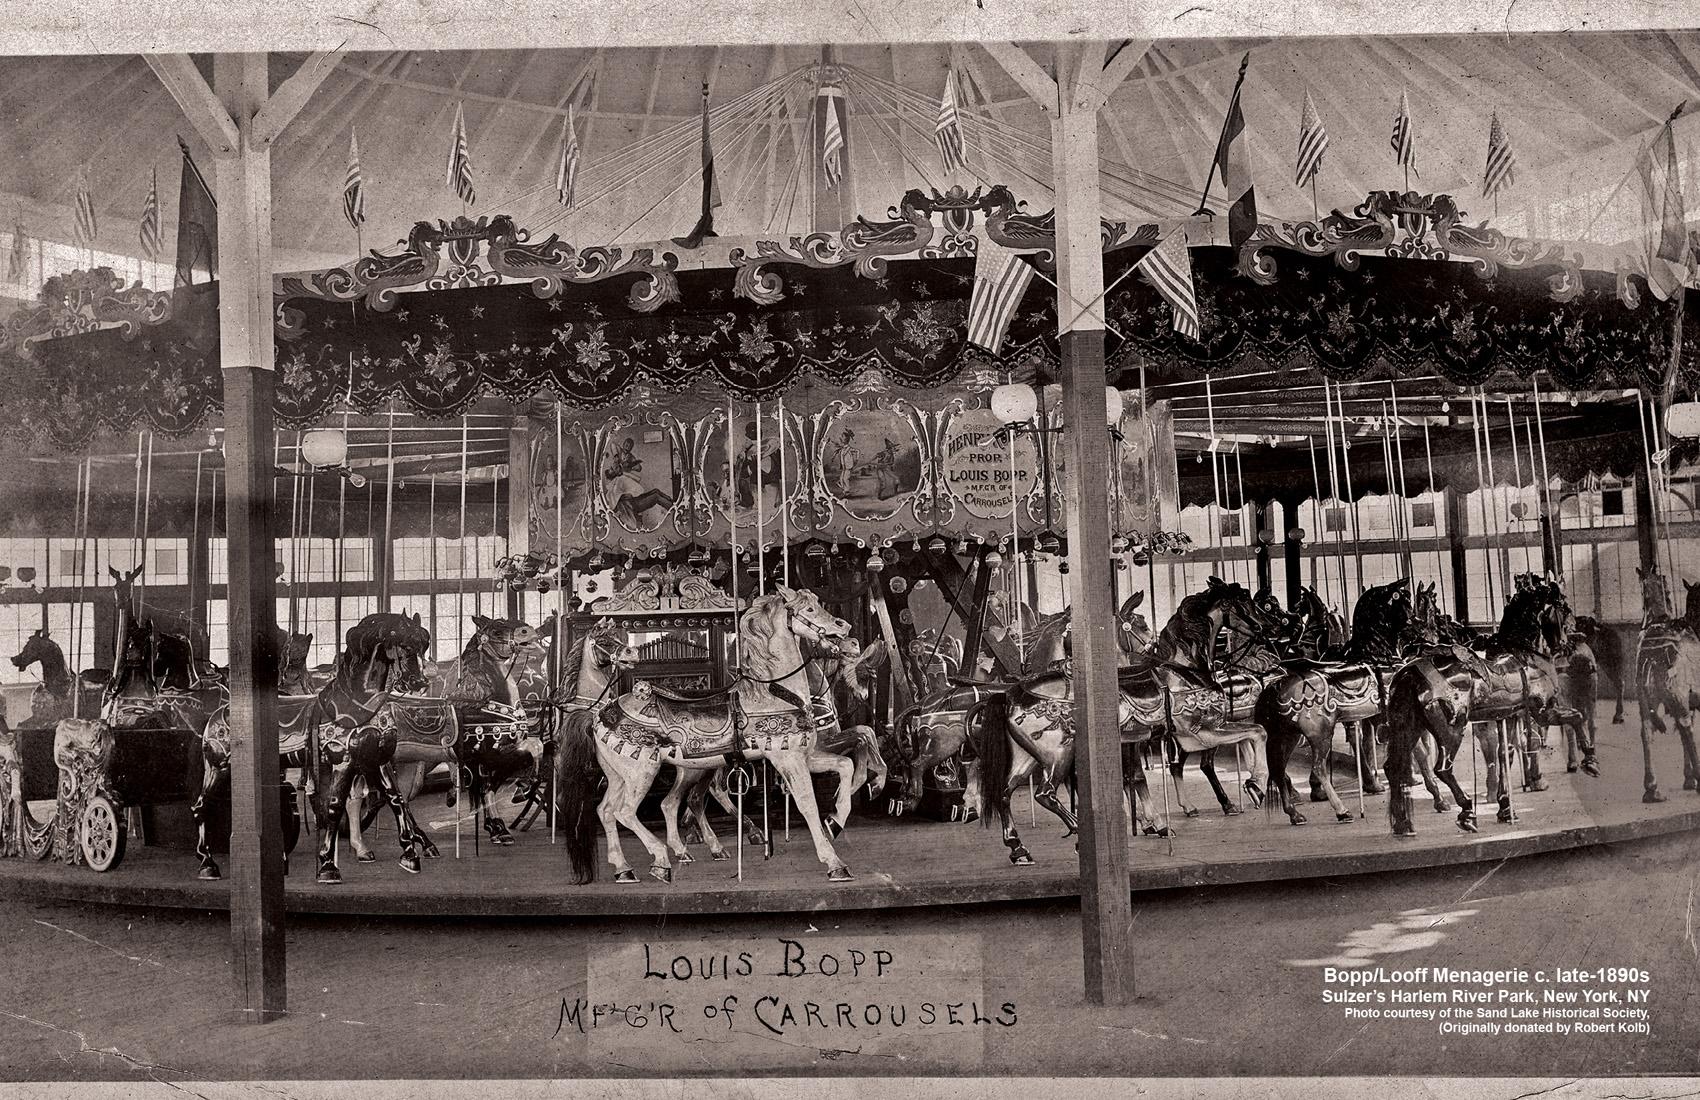 Bopp-Looff-1890s-carousel-Sulzers-Harlem-River-Park-NY-CNT_OCT_10